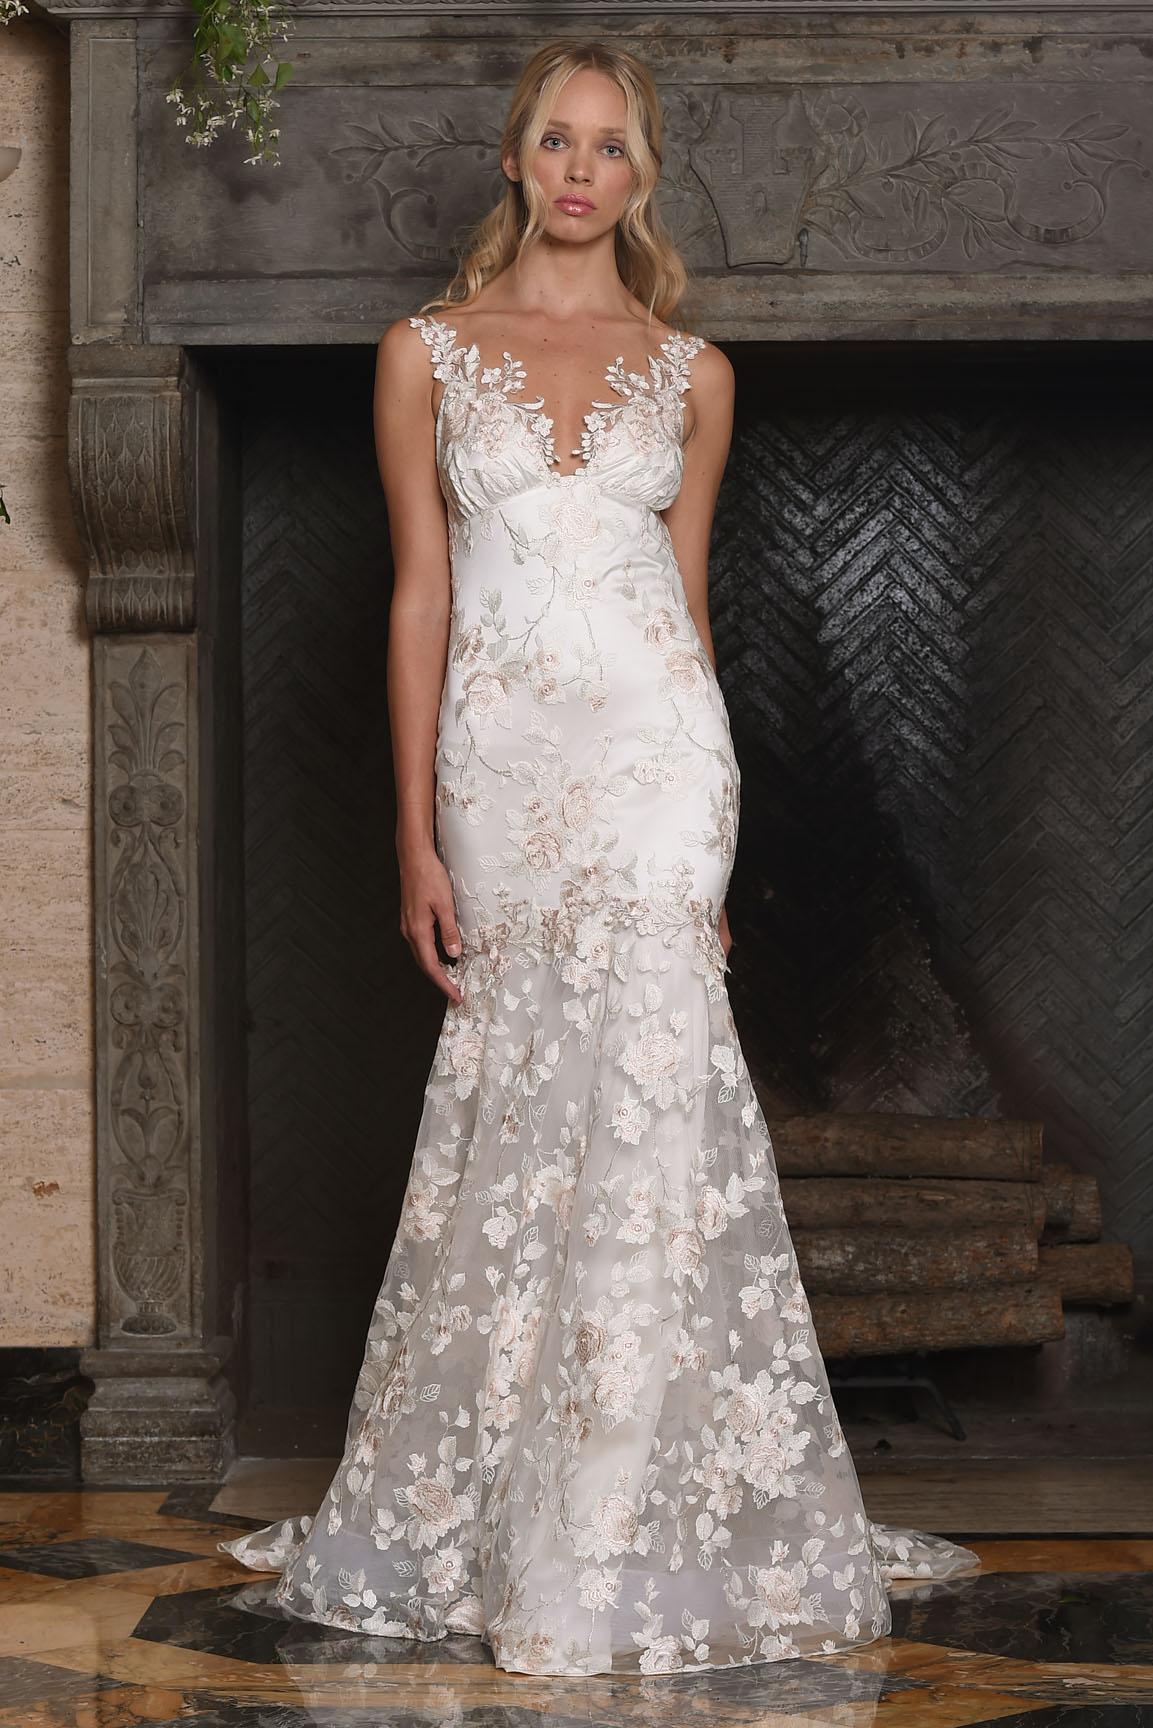 Get The Look Of Audrina Patridge S Wedding Gown